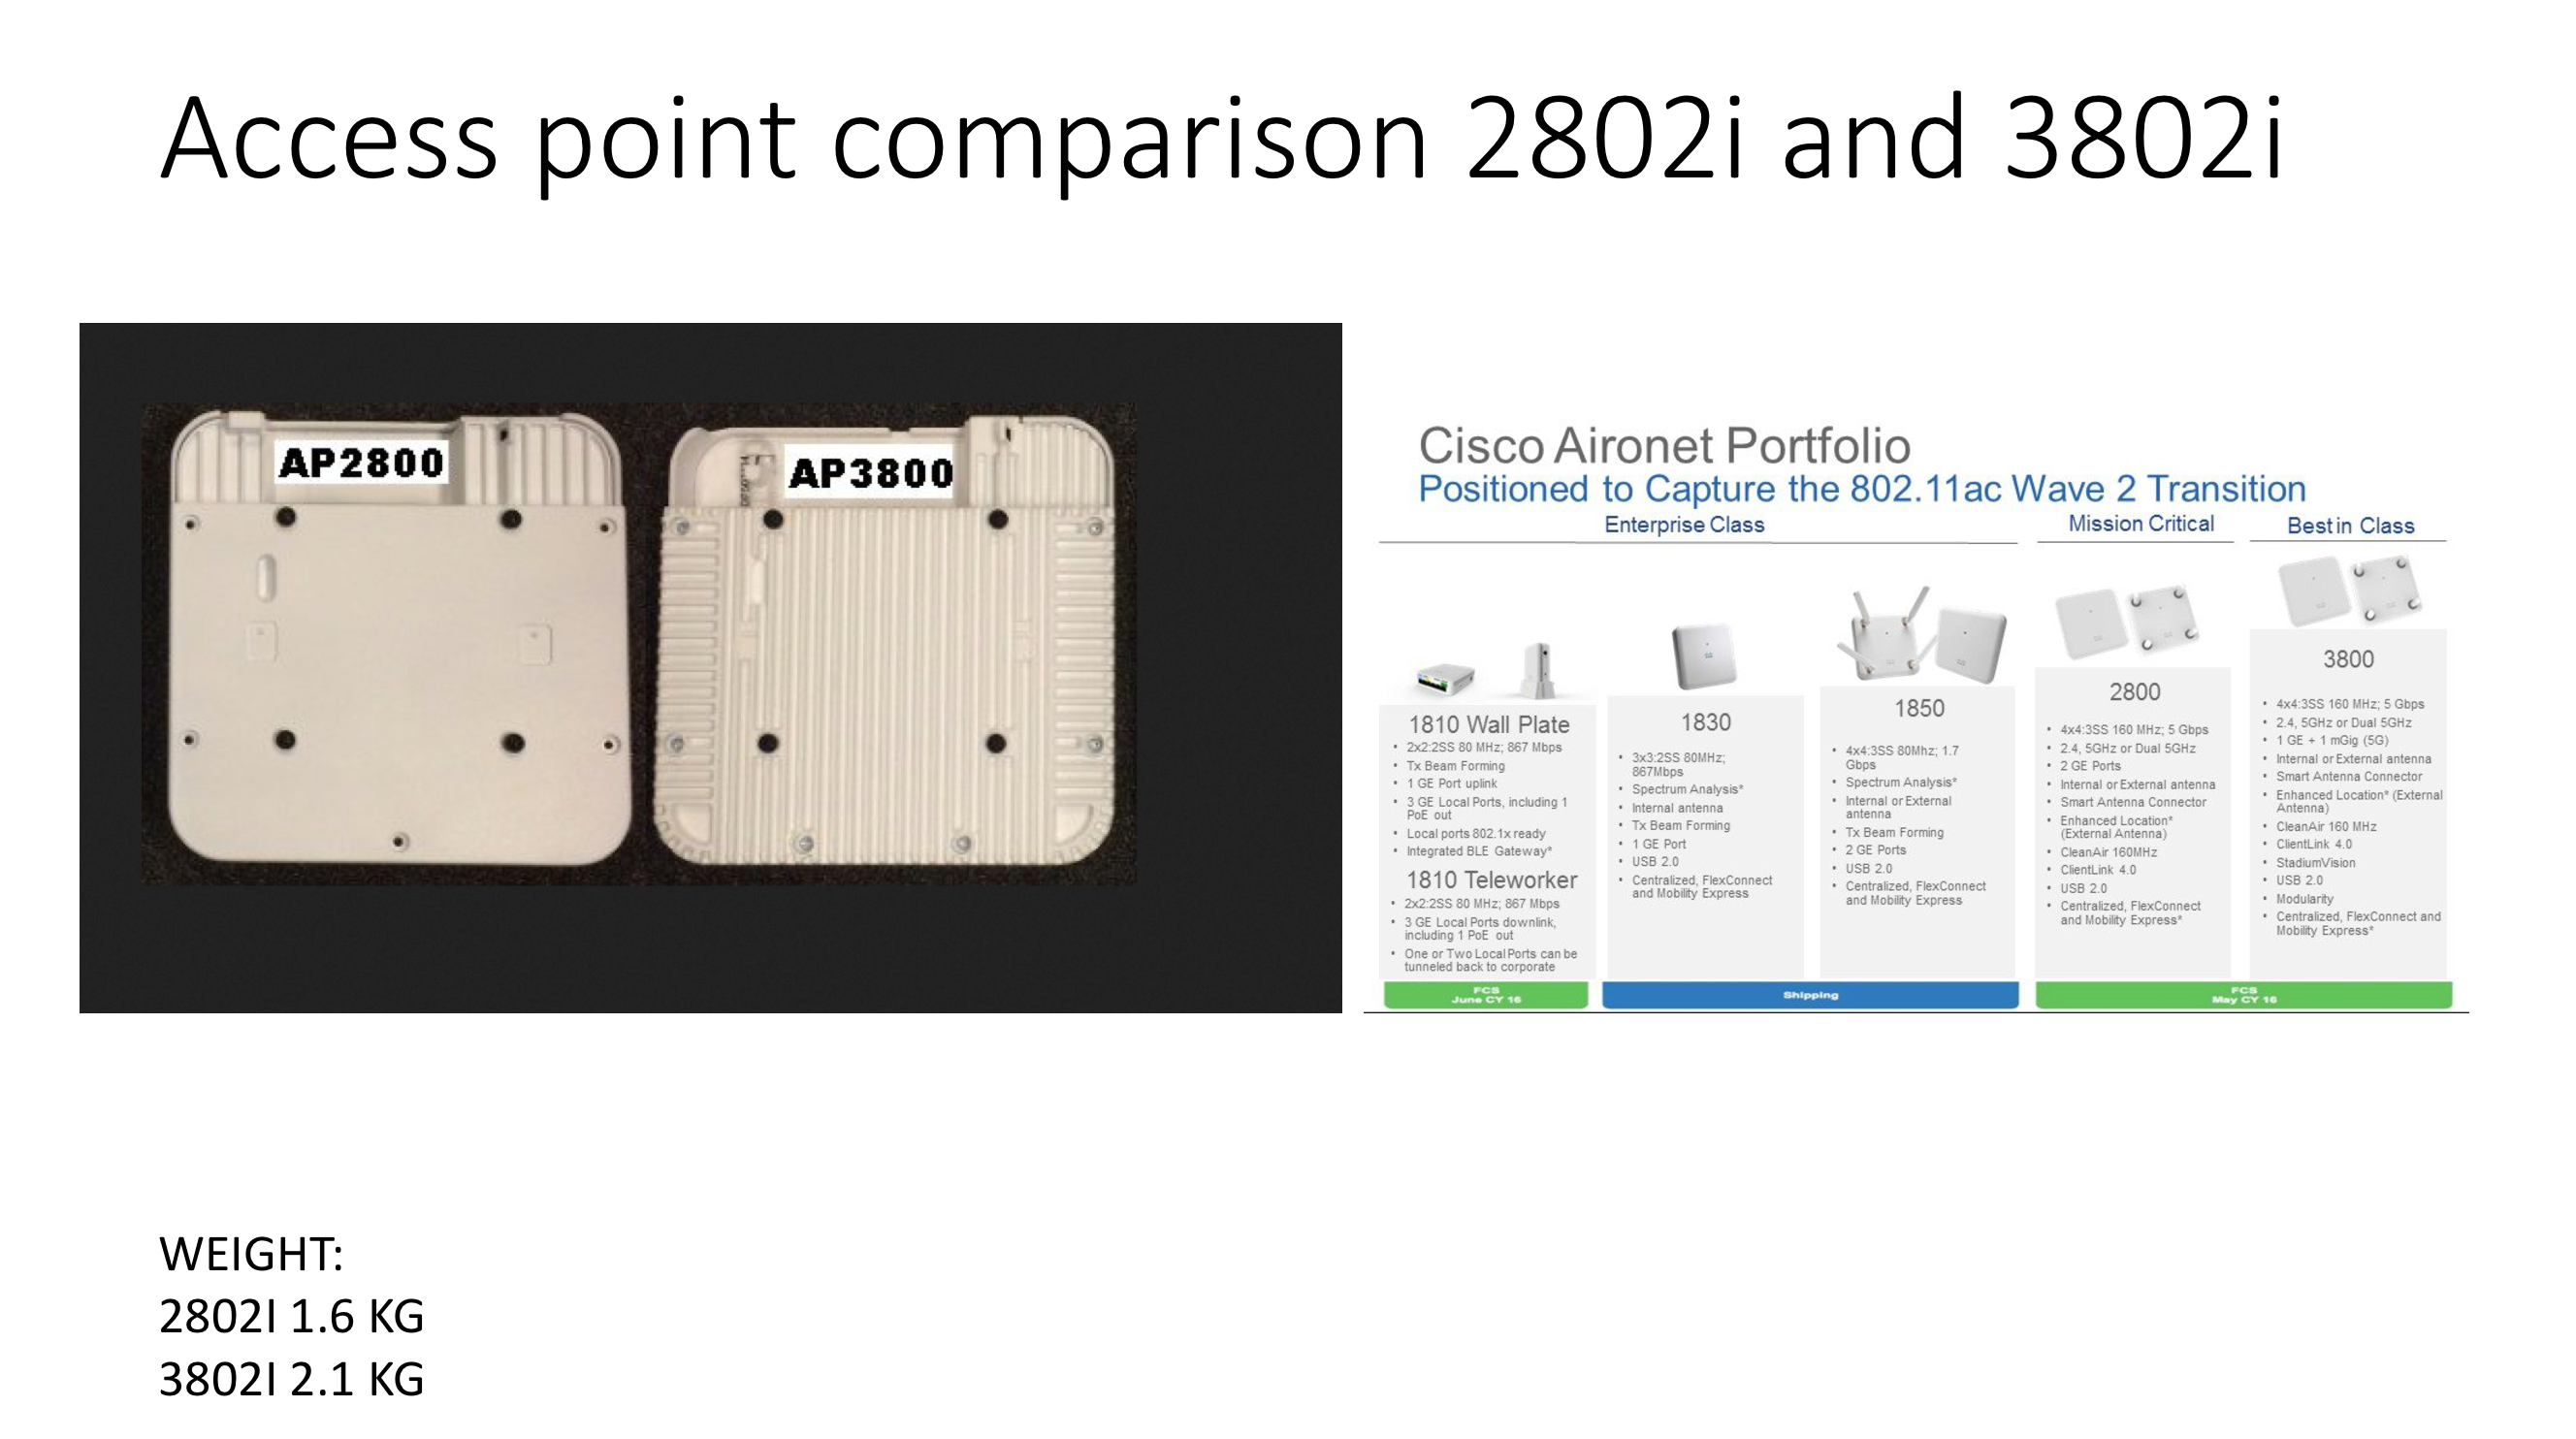 Throughput testing between Cisco 2802i and 3802i access